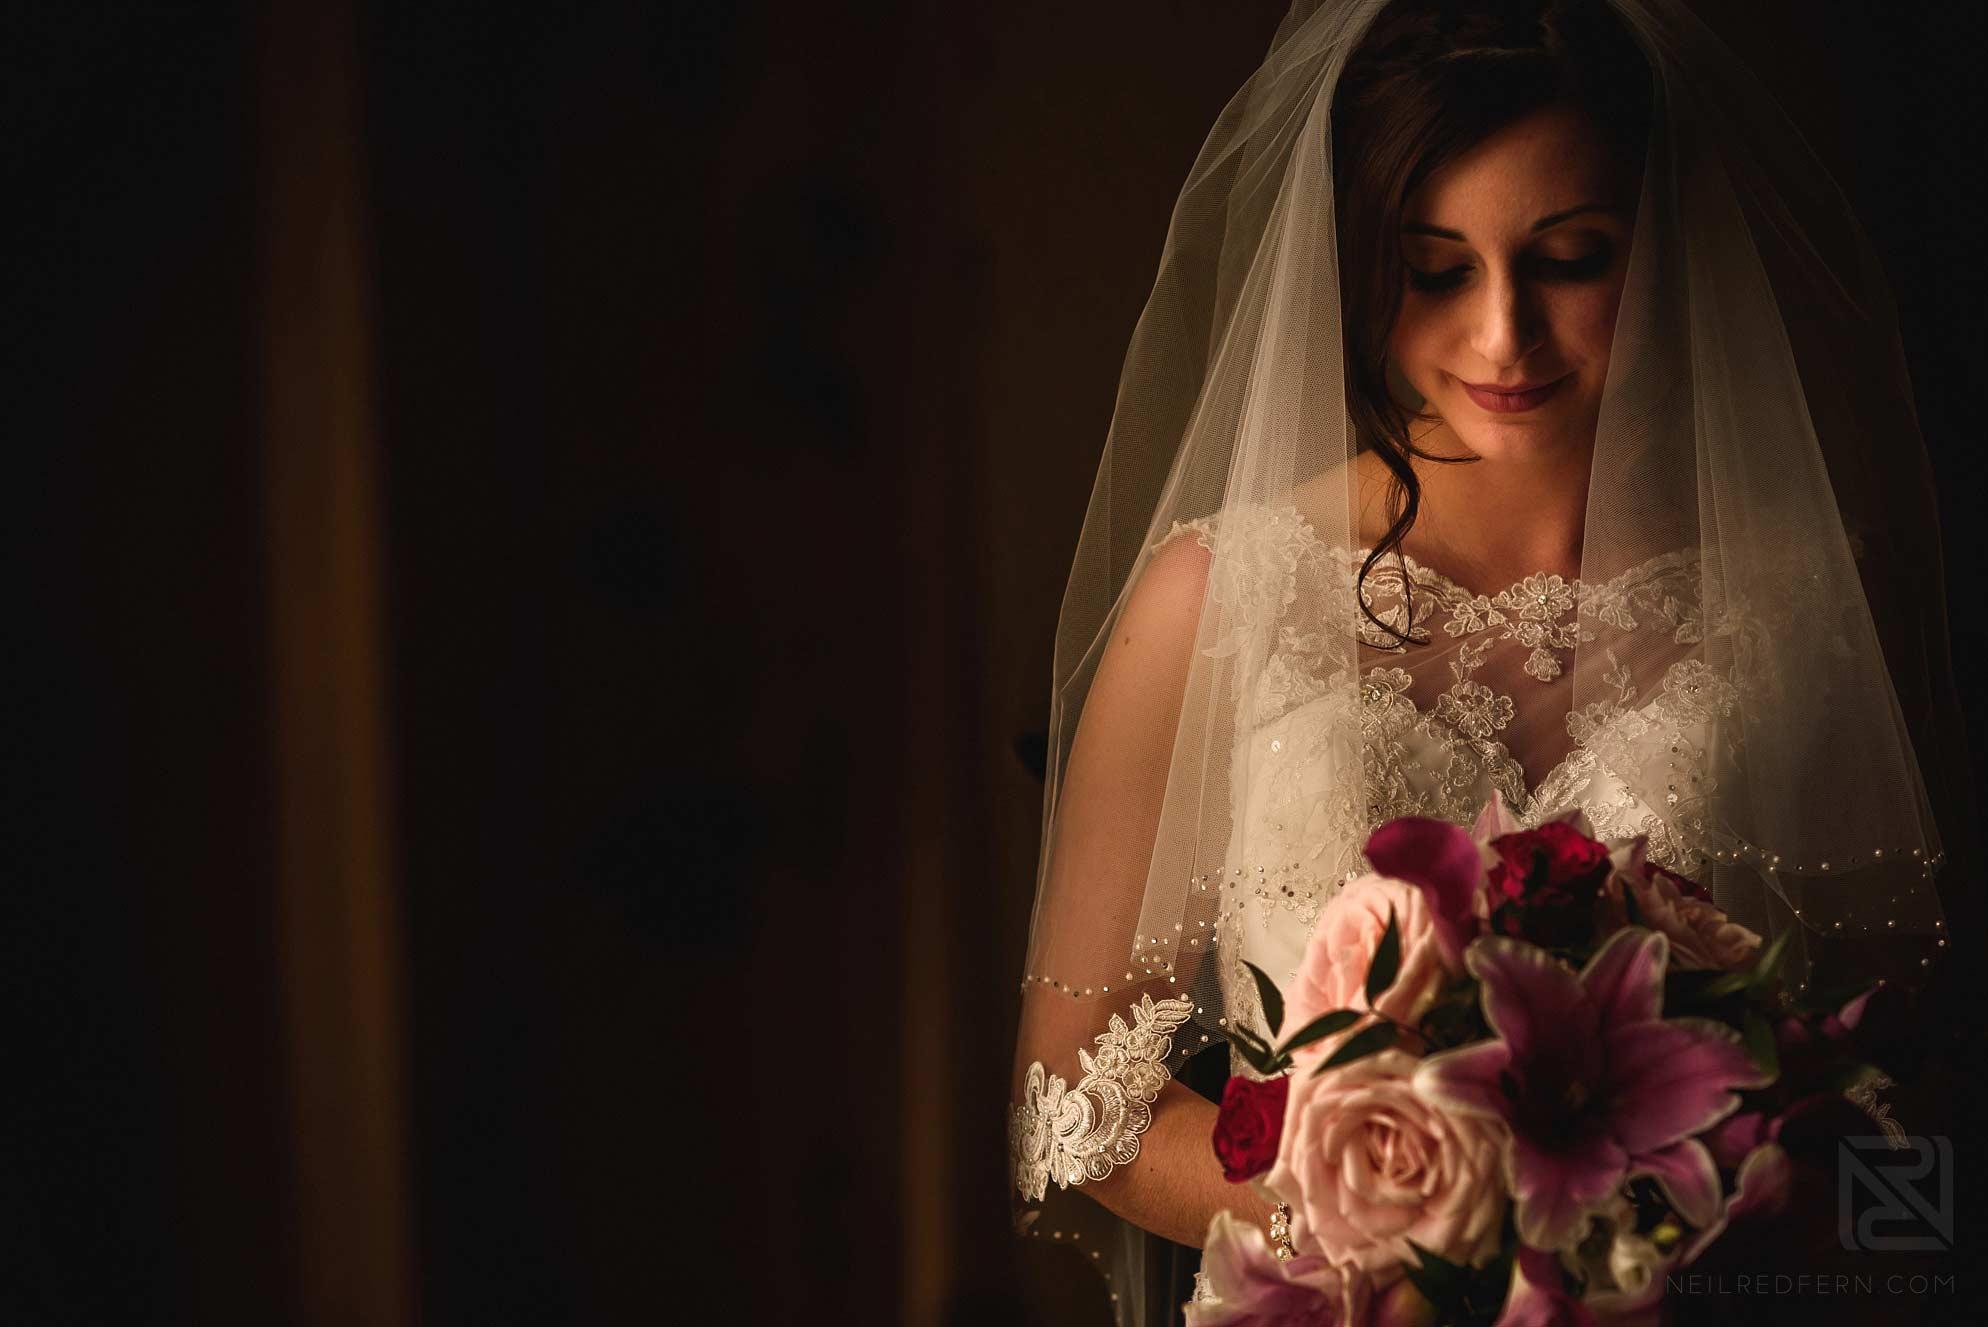 Metropole-Hotel-Llandrindod-Wells-wedding-02